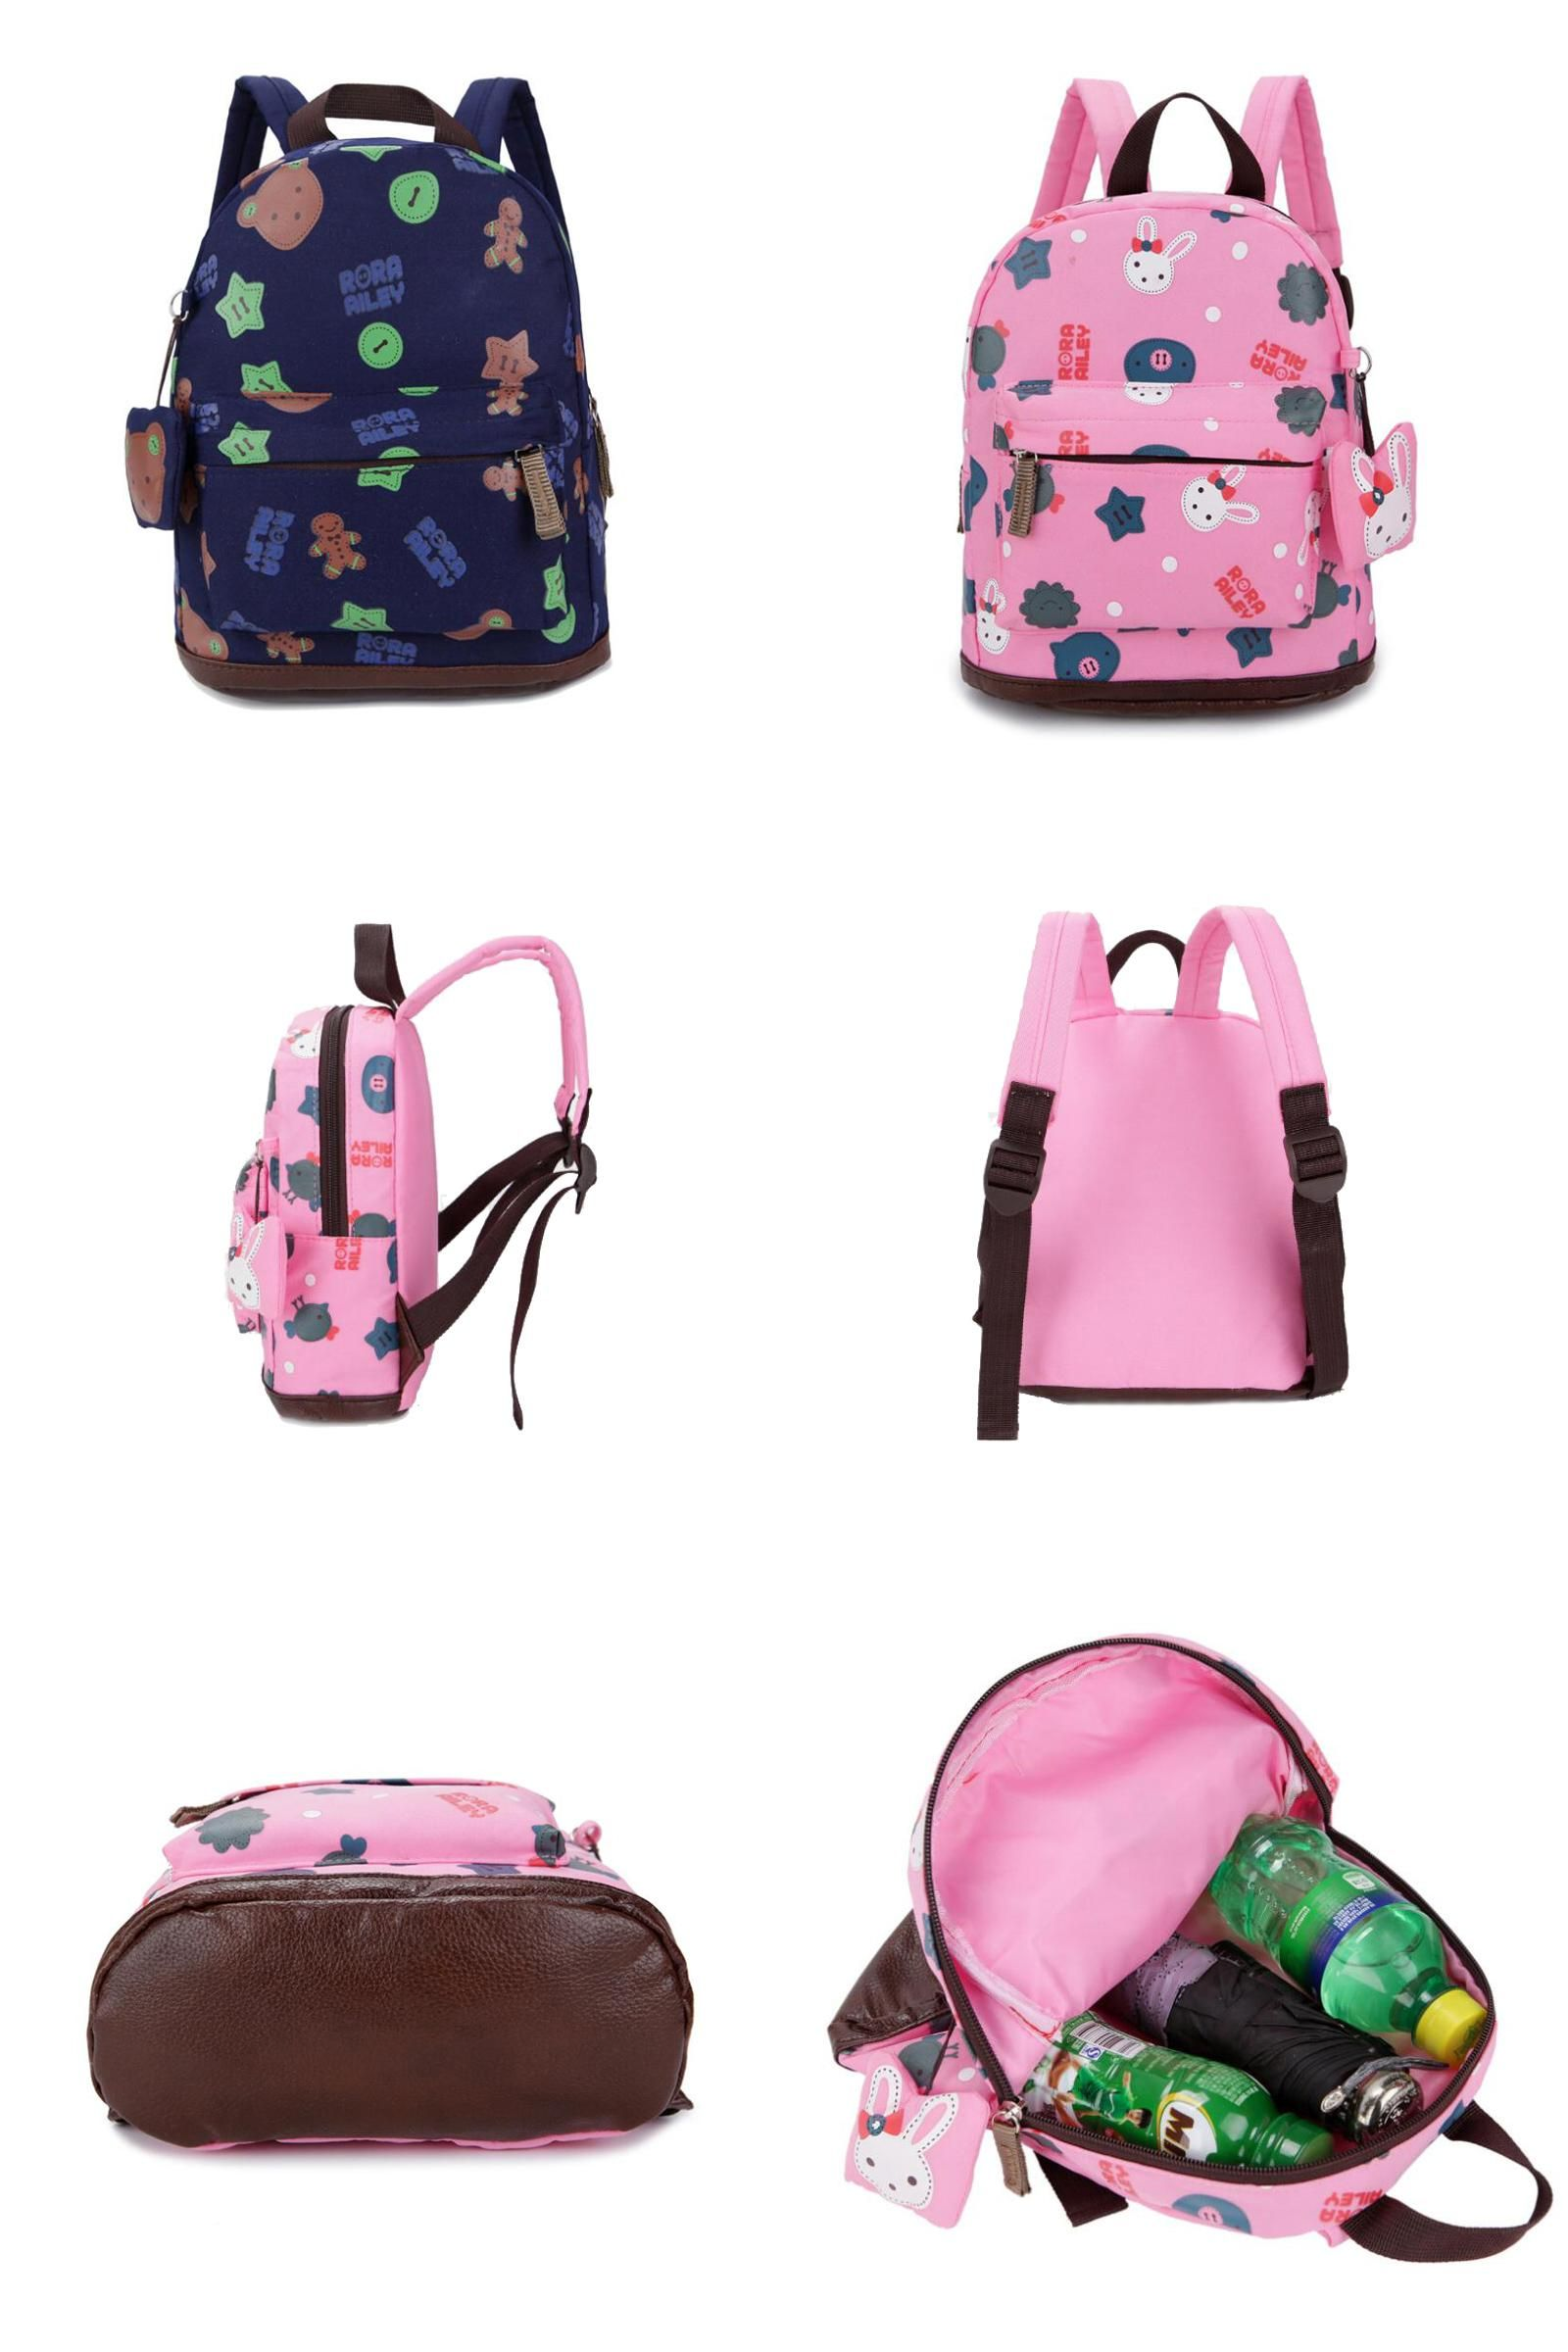 8828a35c70  Visit to Buy  Canvas backpack dark blue cartoon bear Kids print school bags  for